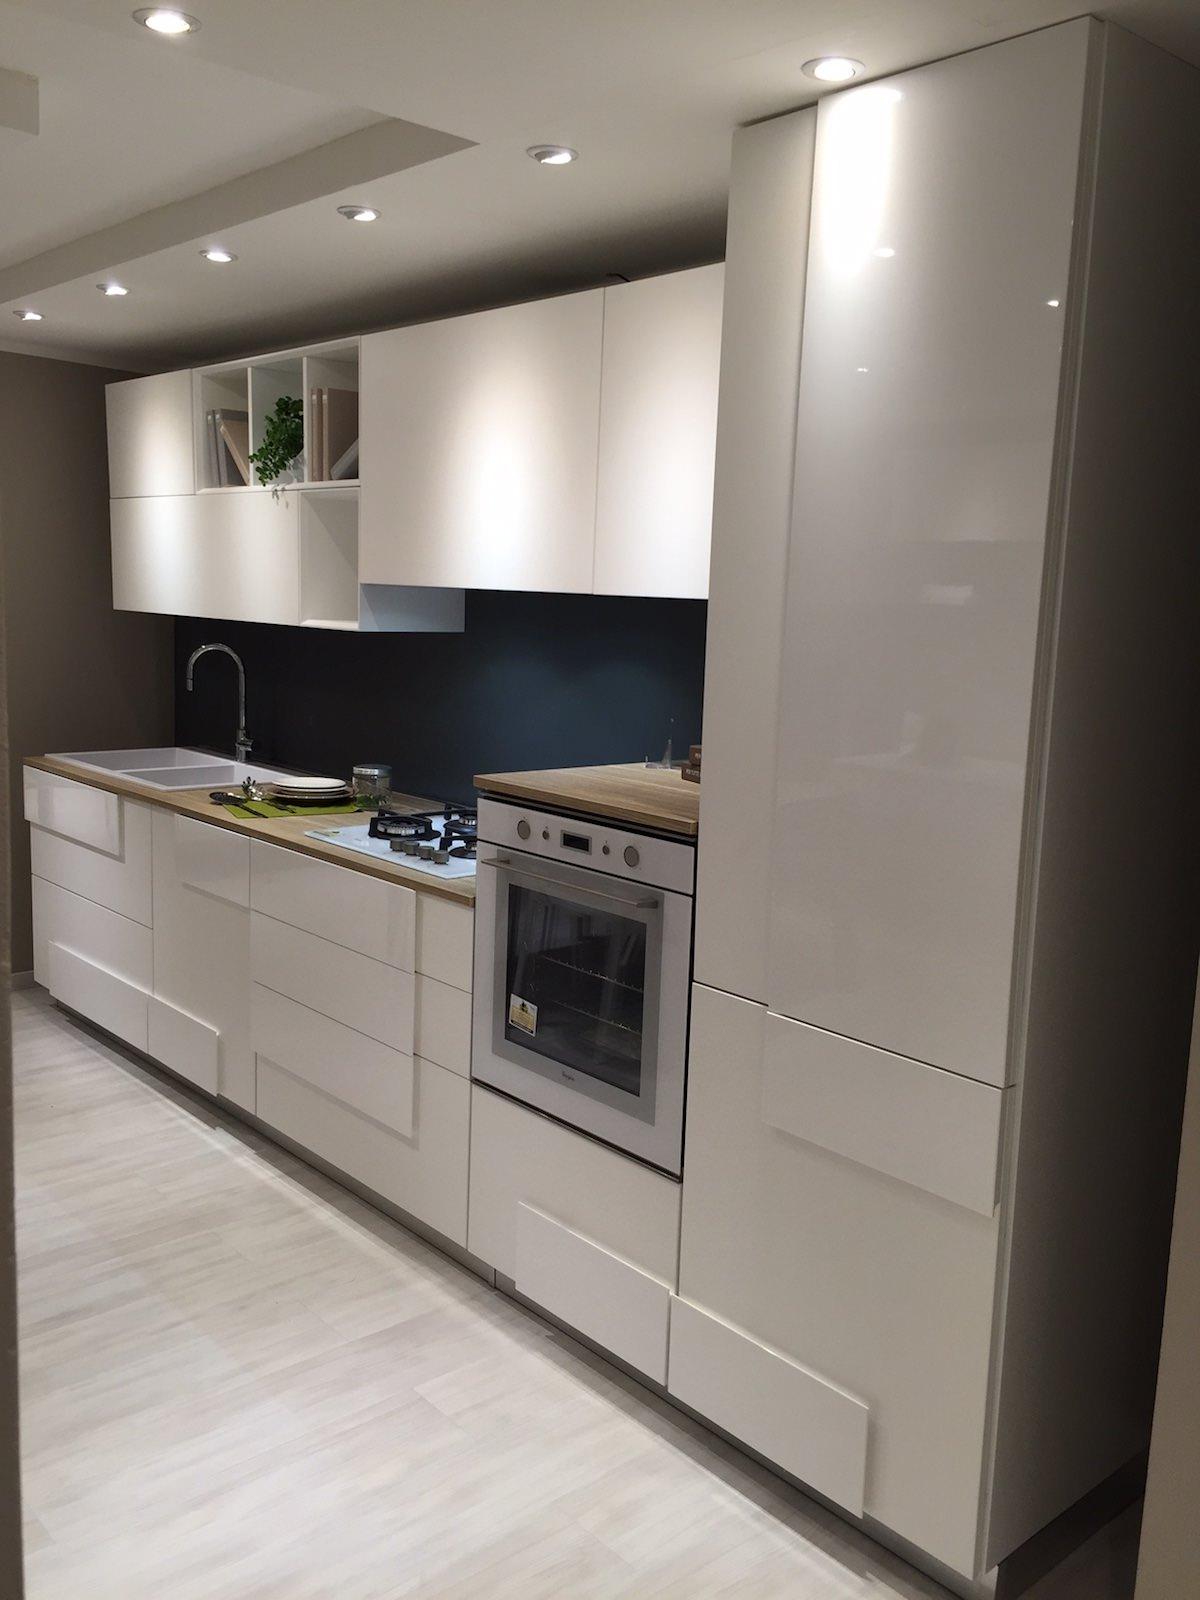 cucina-lube-mod-creativa-outlet-rafaschieri-2 - Rafaschieri Arredamenti